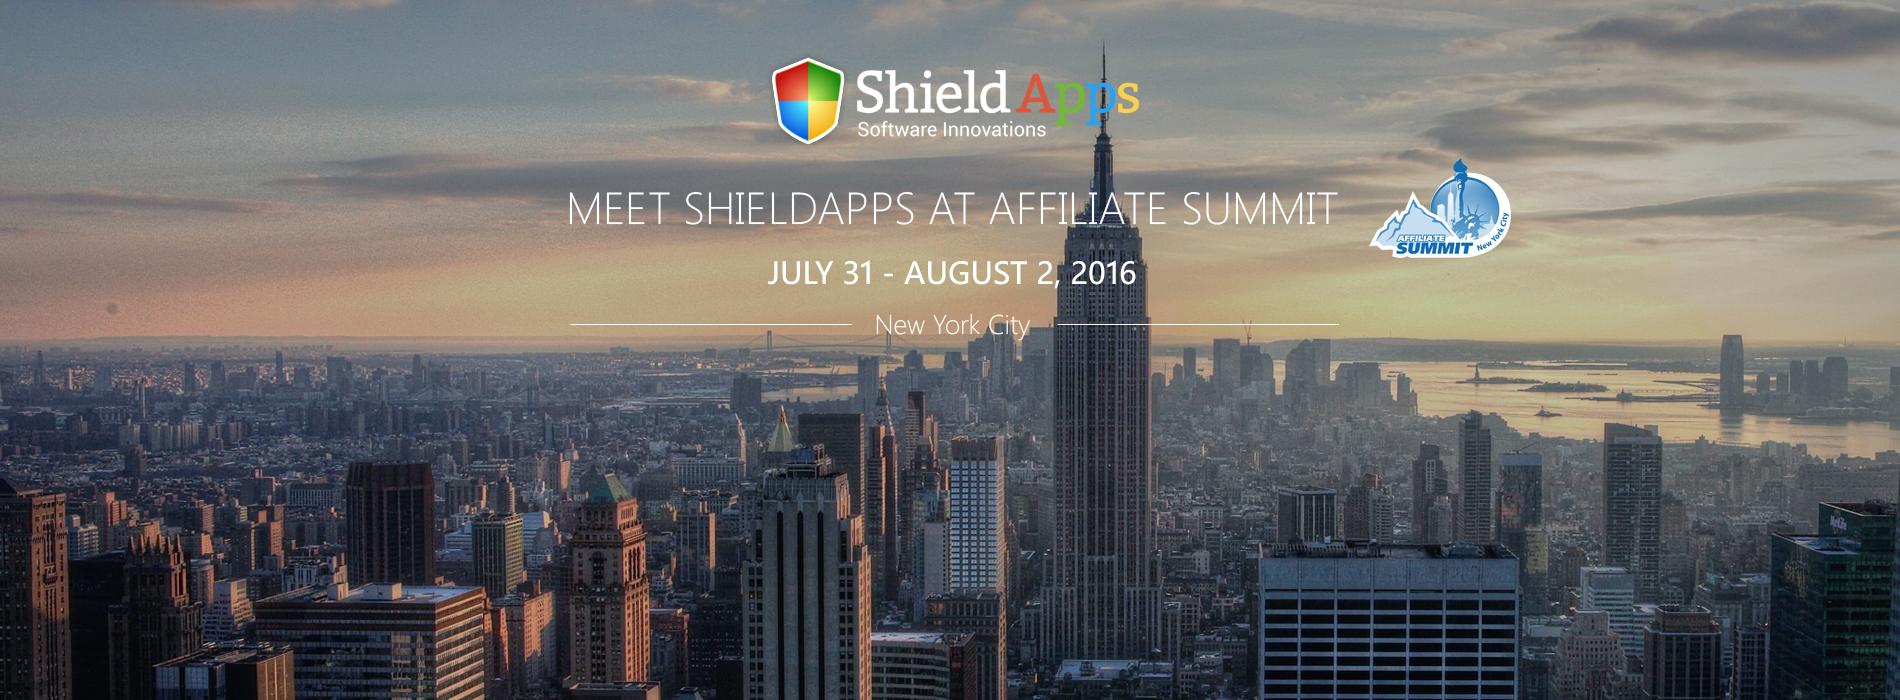 shieldapps affiliate banner 2